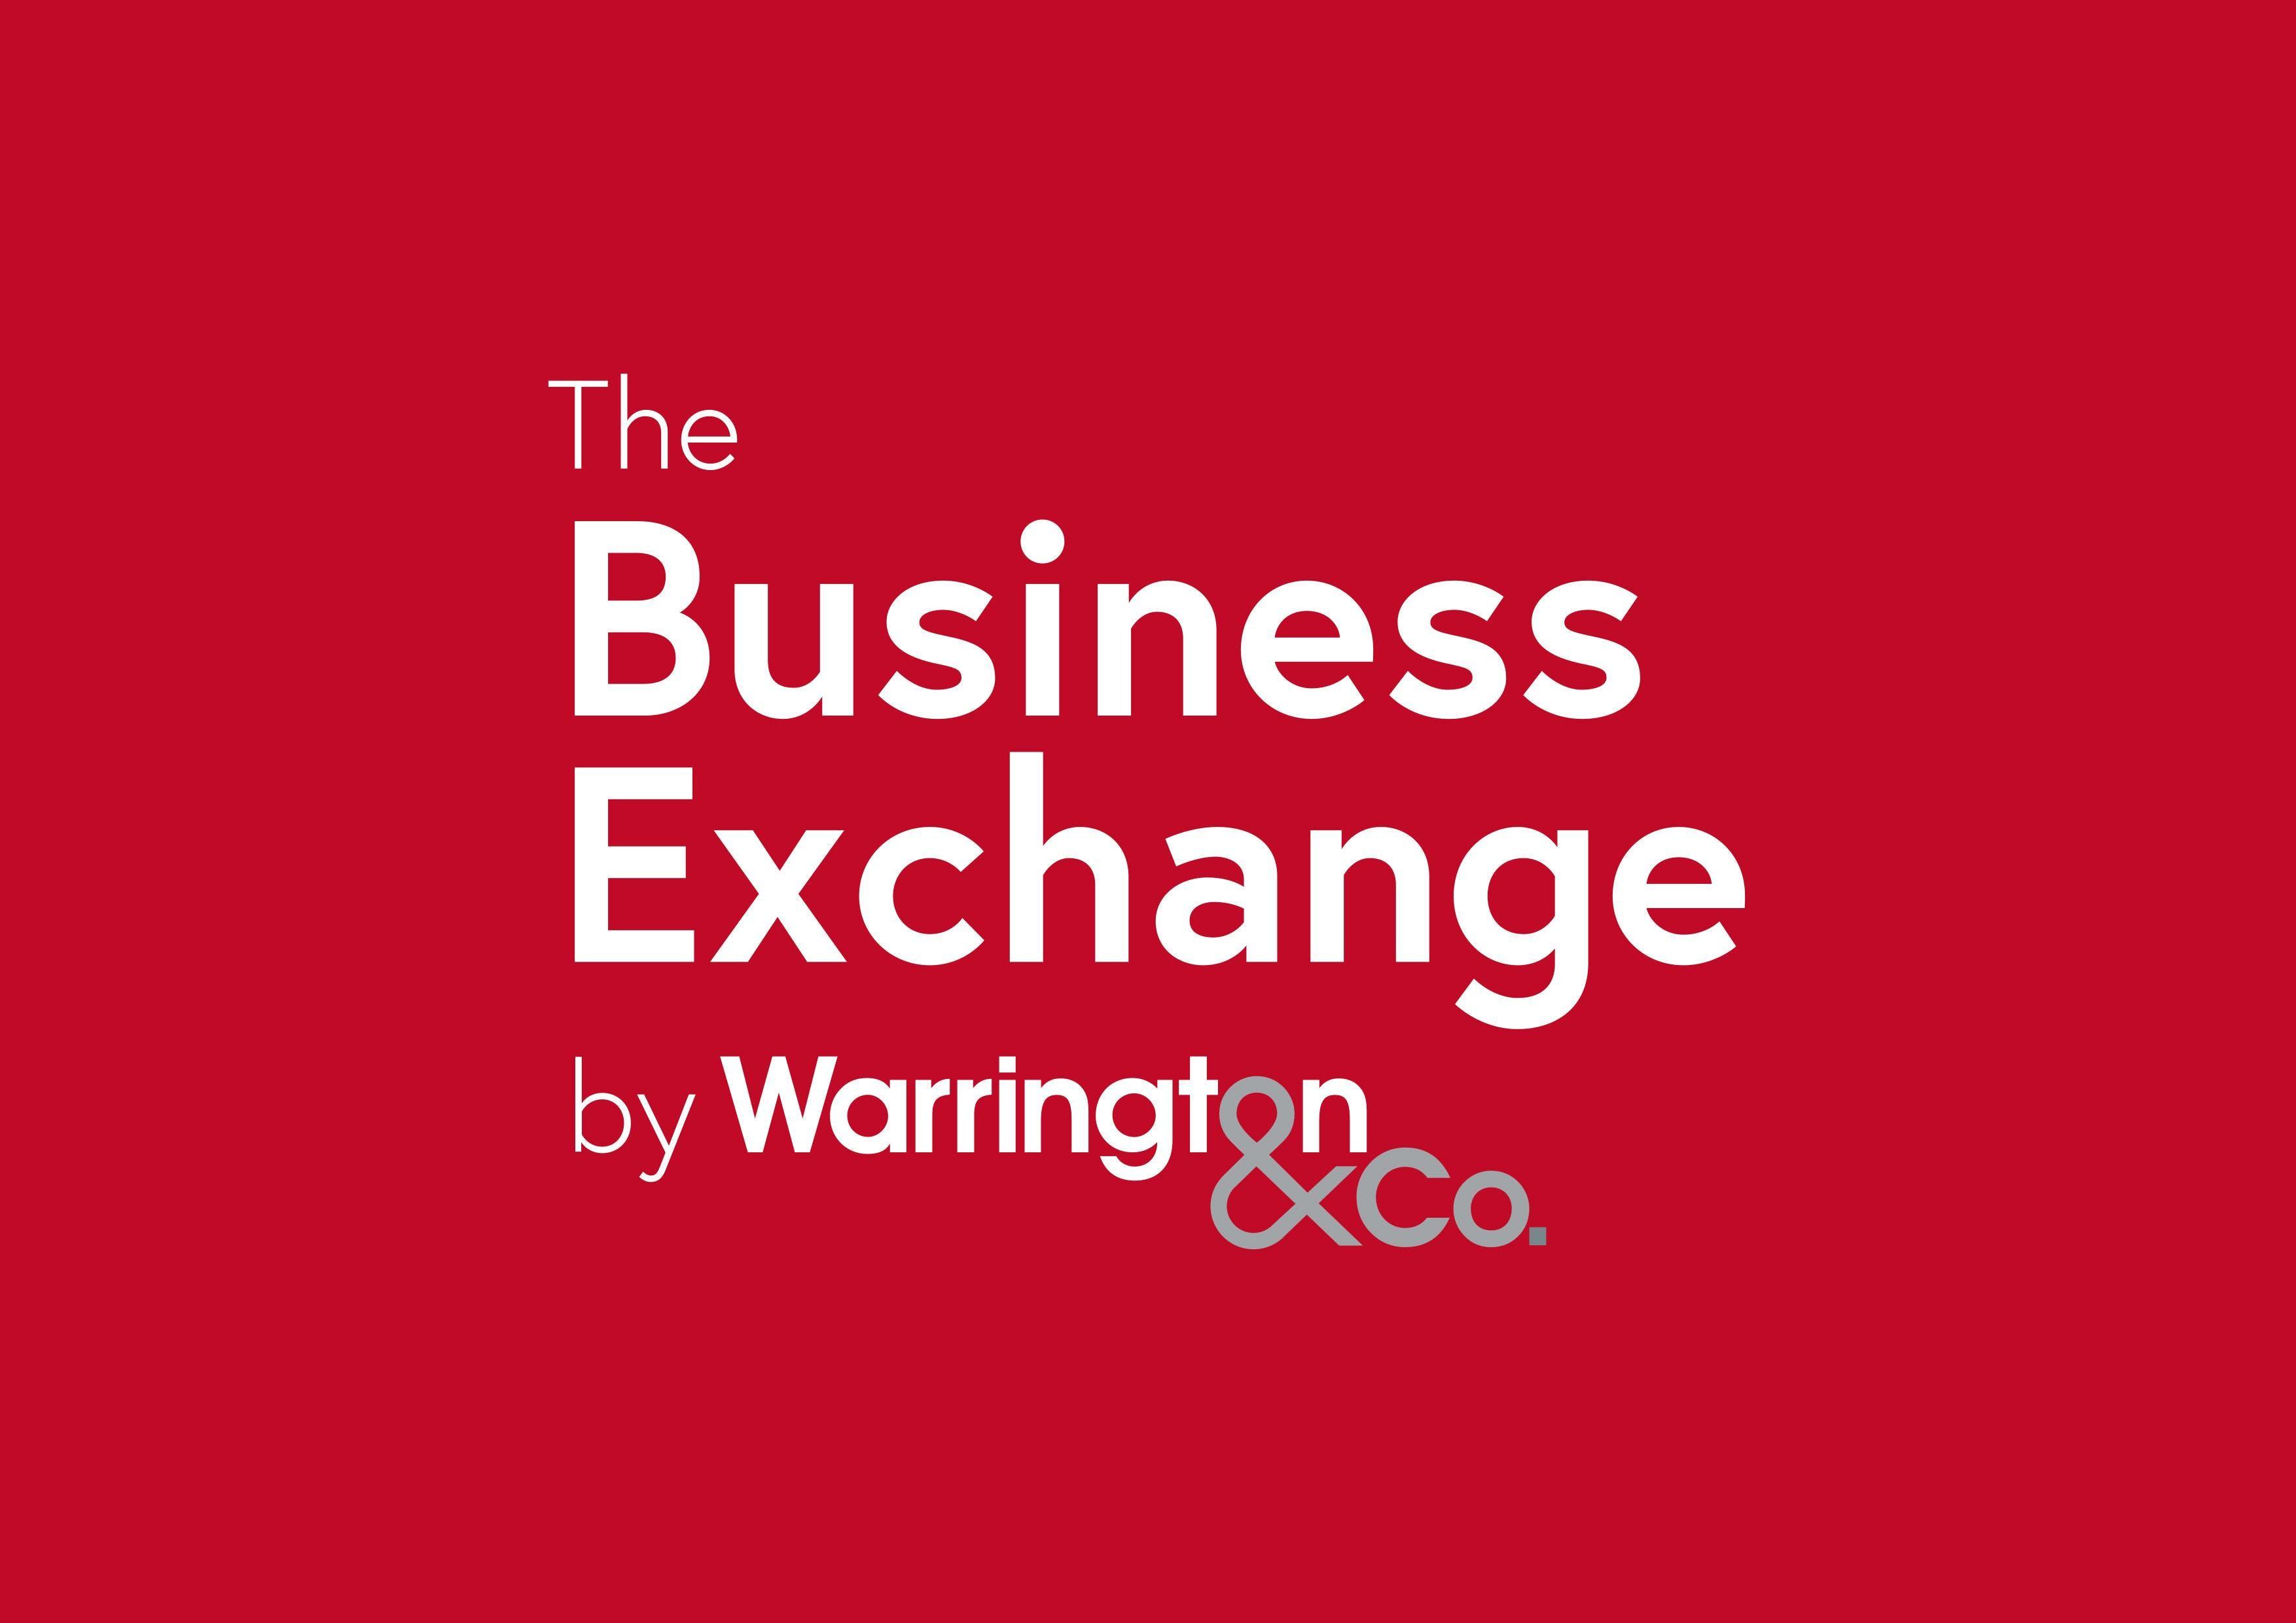 Launch of the Warrington Business Exchange He